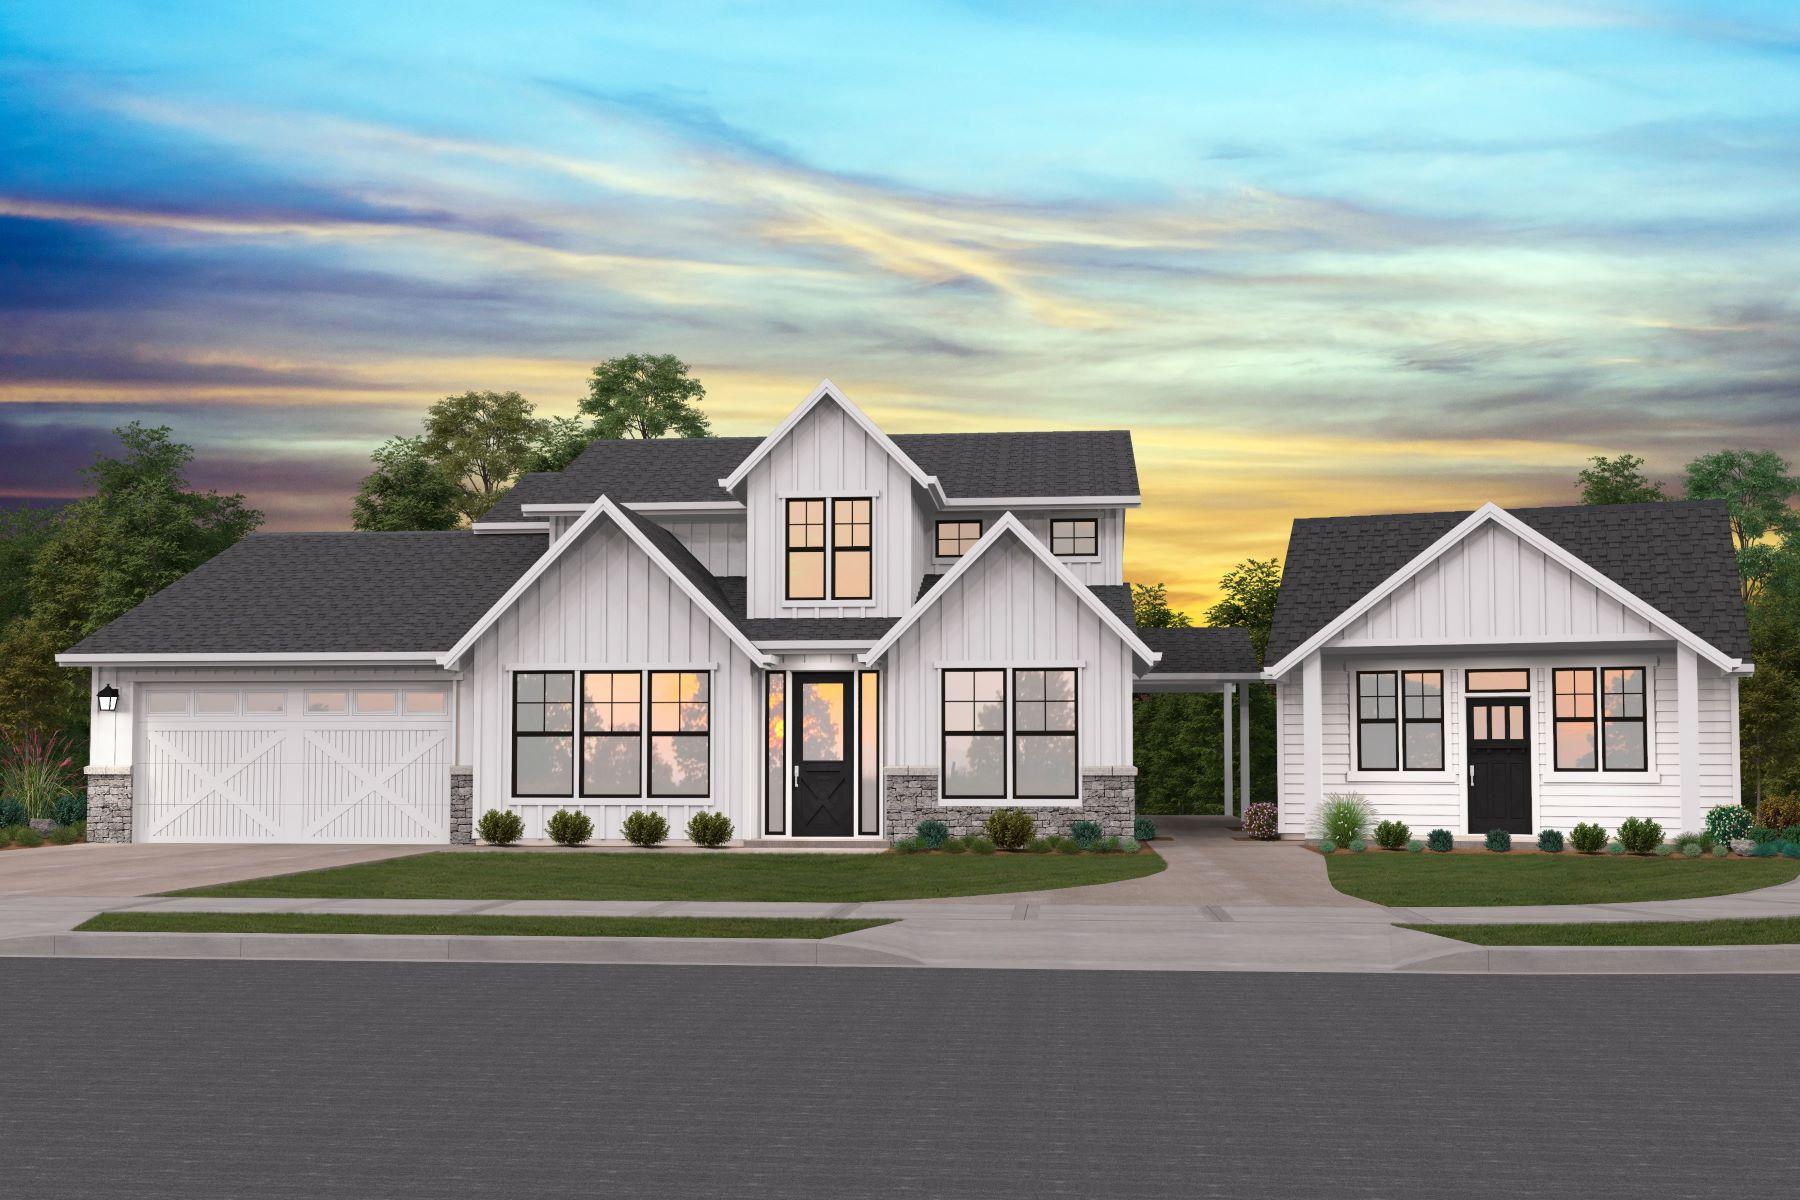 Single Family Homes for Sale at 7611 Myers Road East, Bonney Lake, WA 98391 7611 Myers Rd E Bonney Lake, Washington 98391 United States